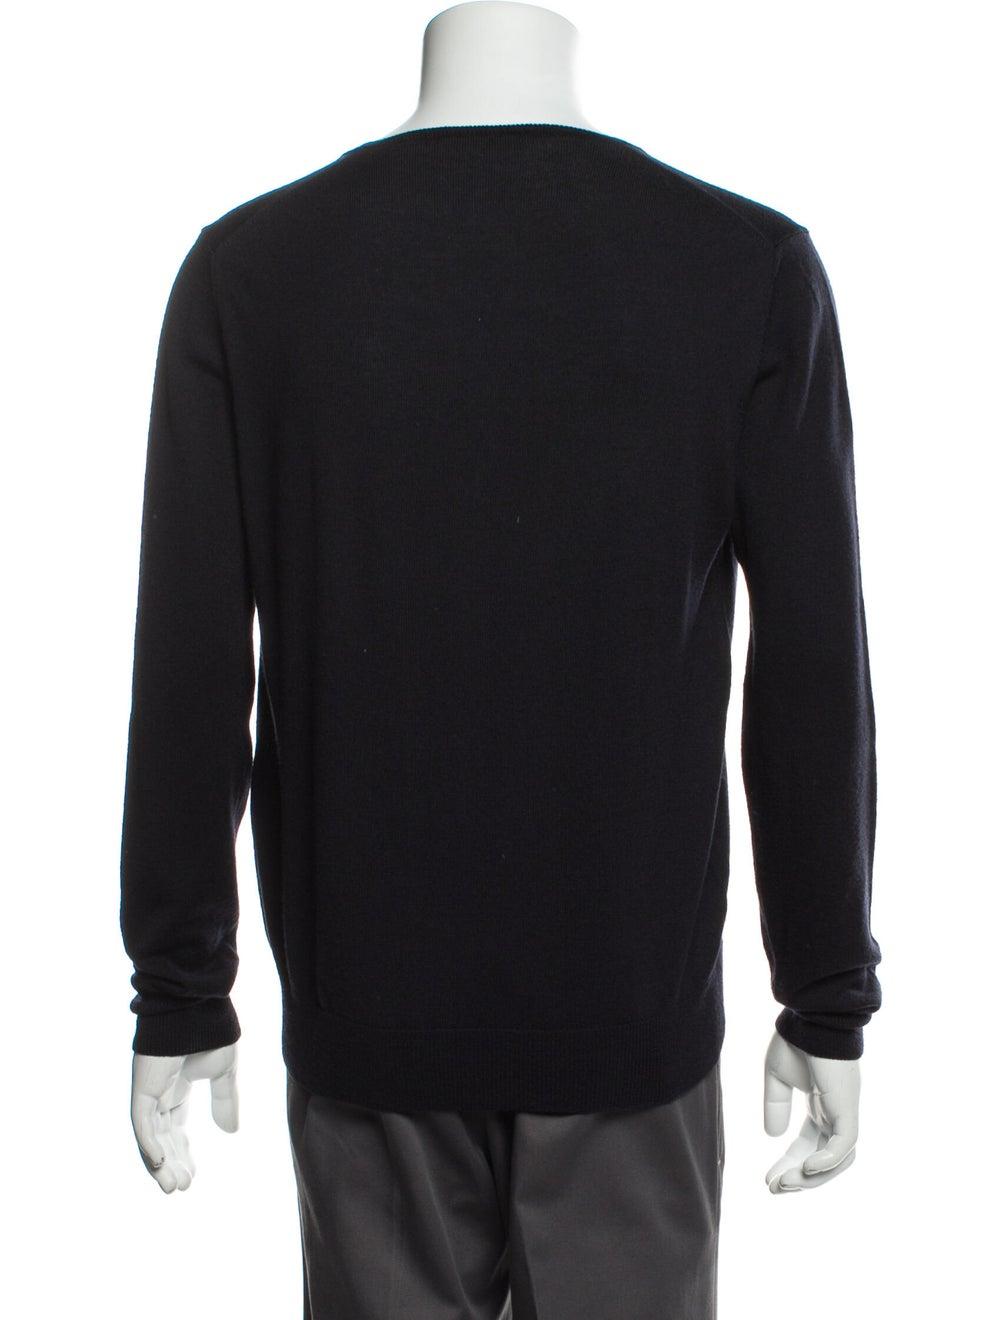 Prada Wool V-Neck Pullover Wool - image 3